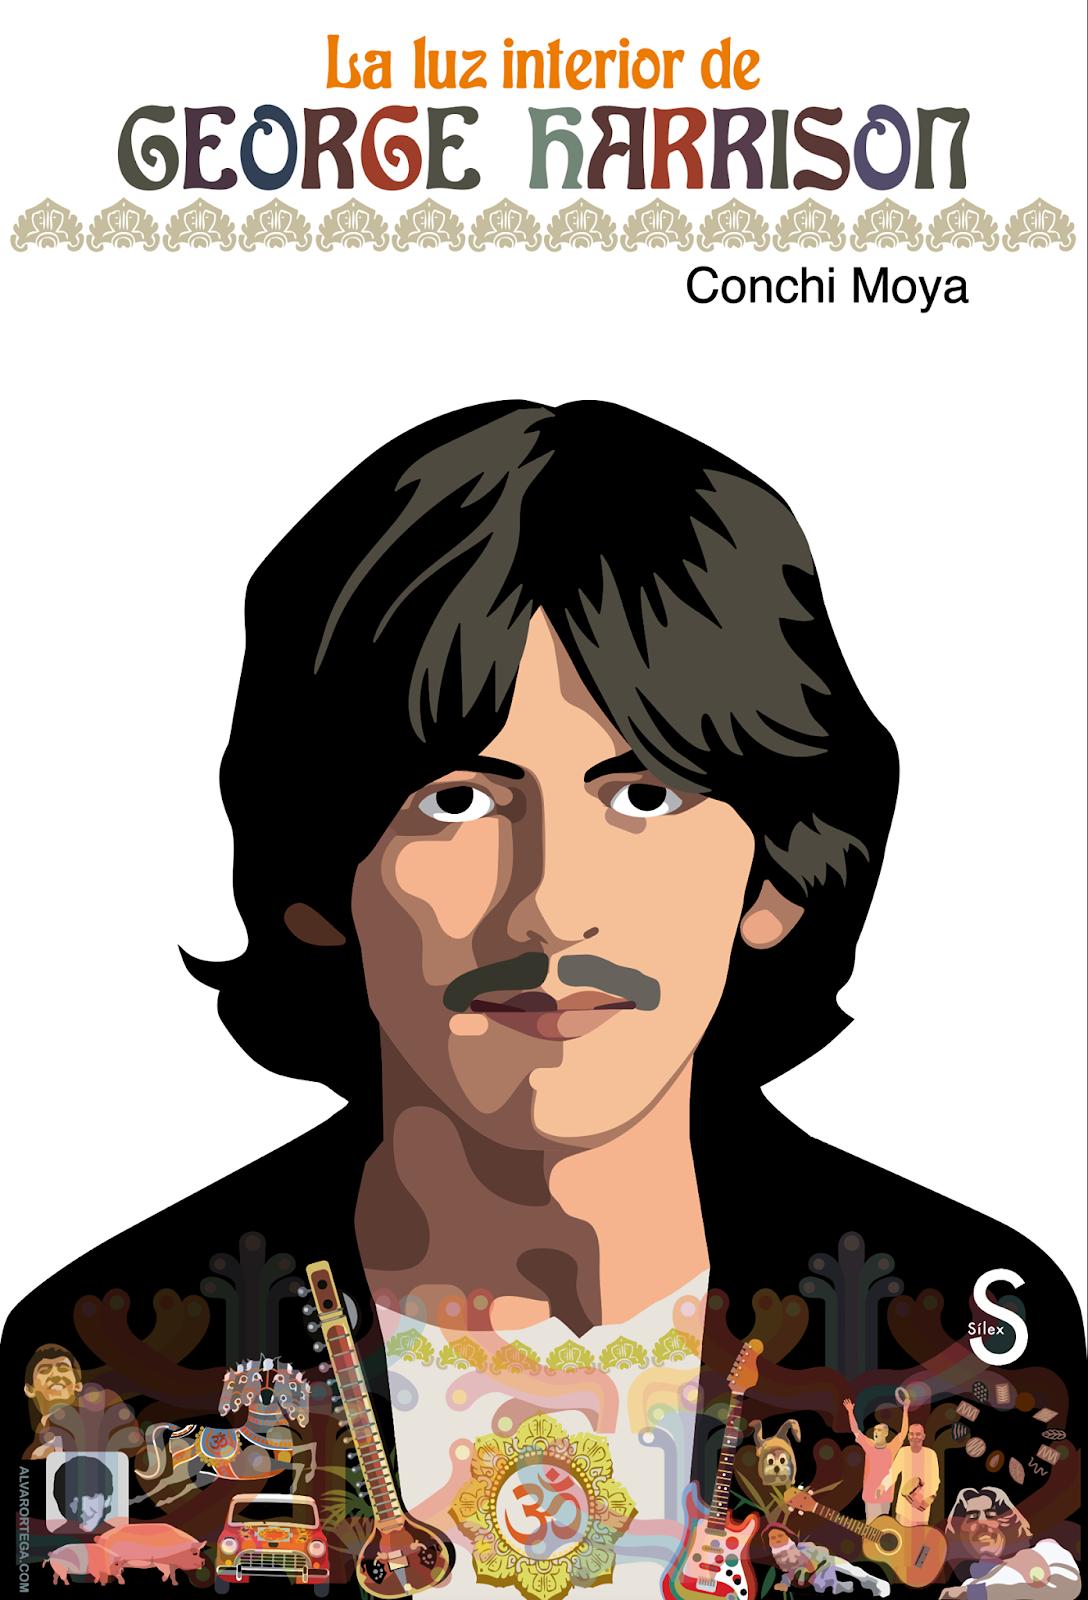 La luz interior de George Harrison